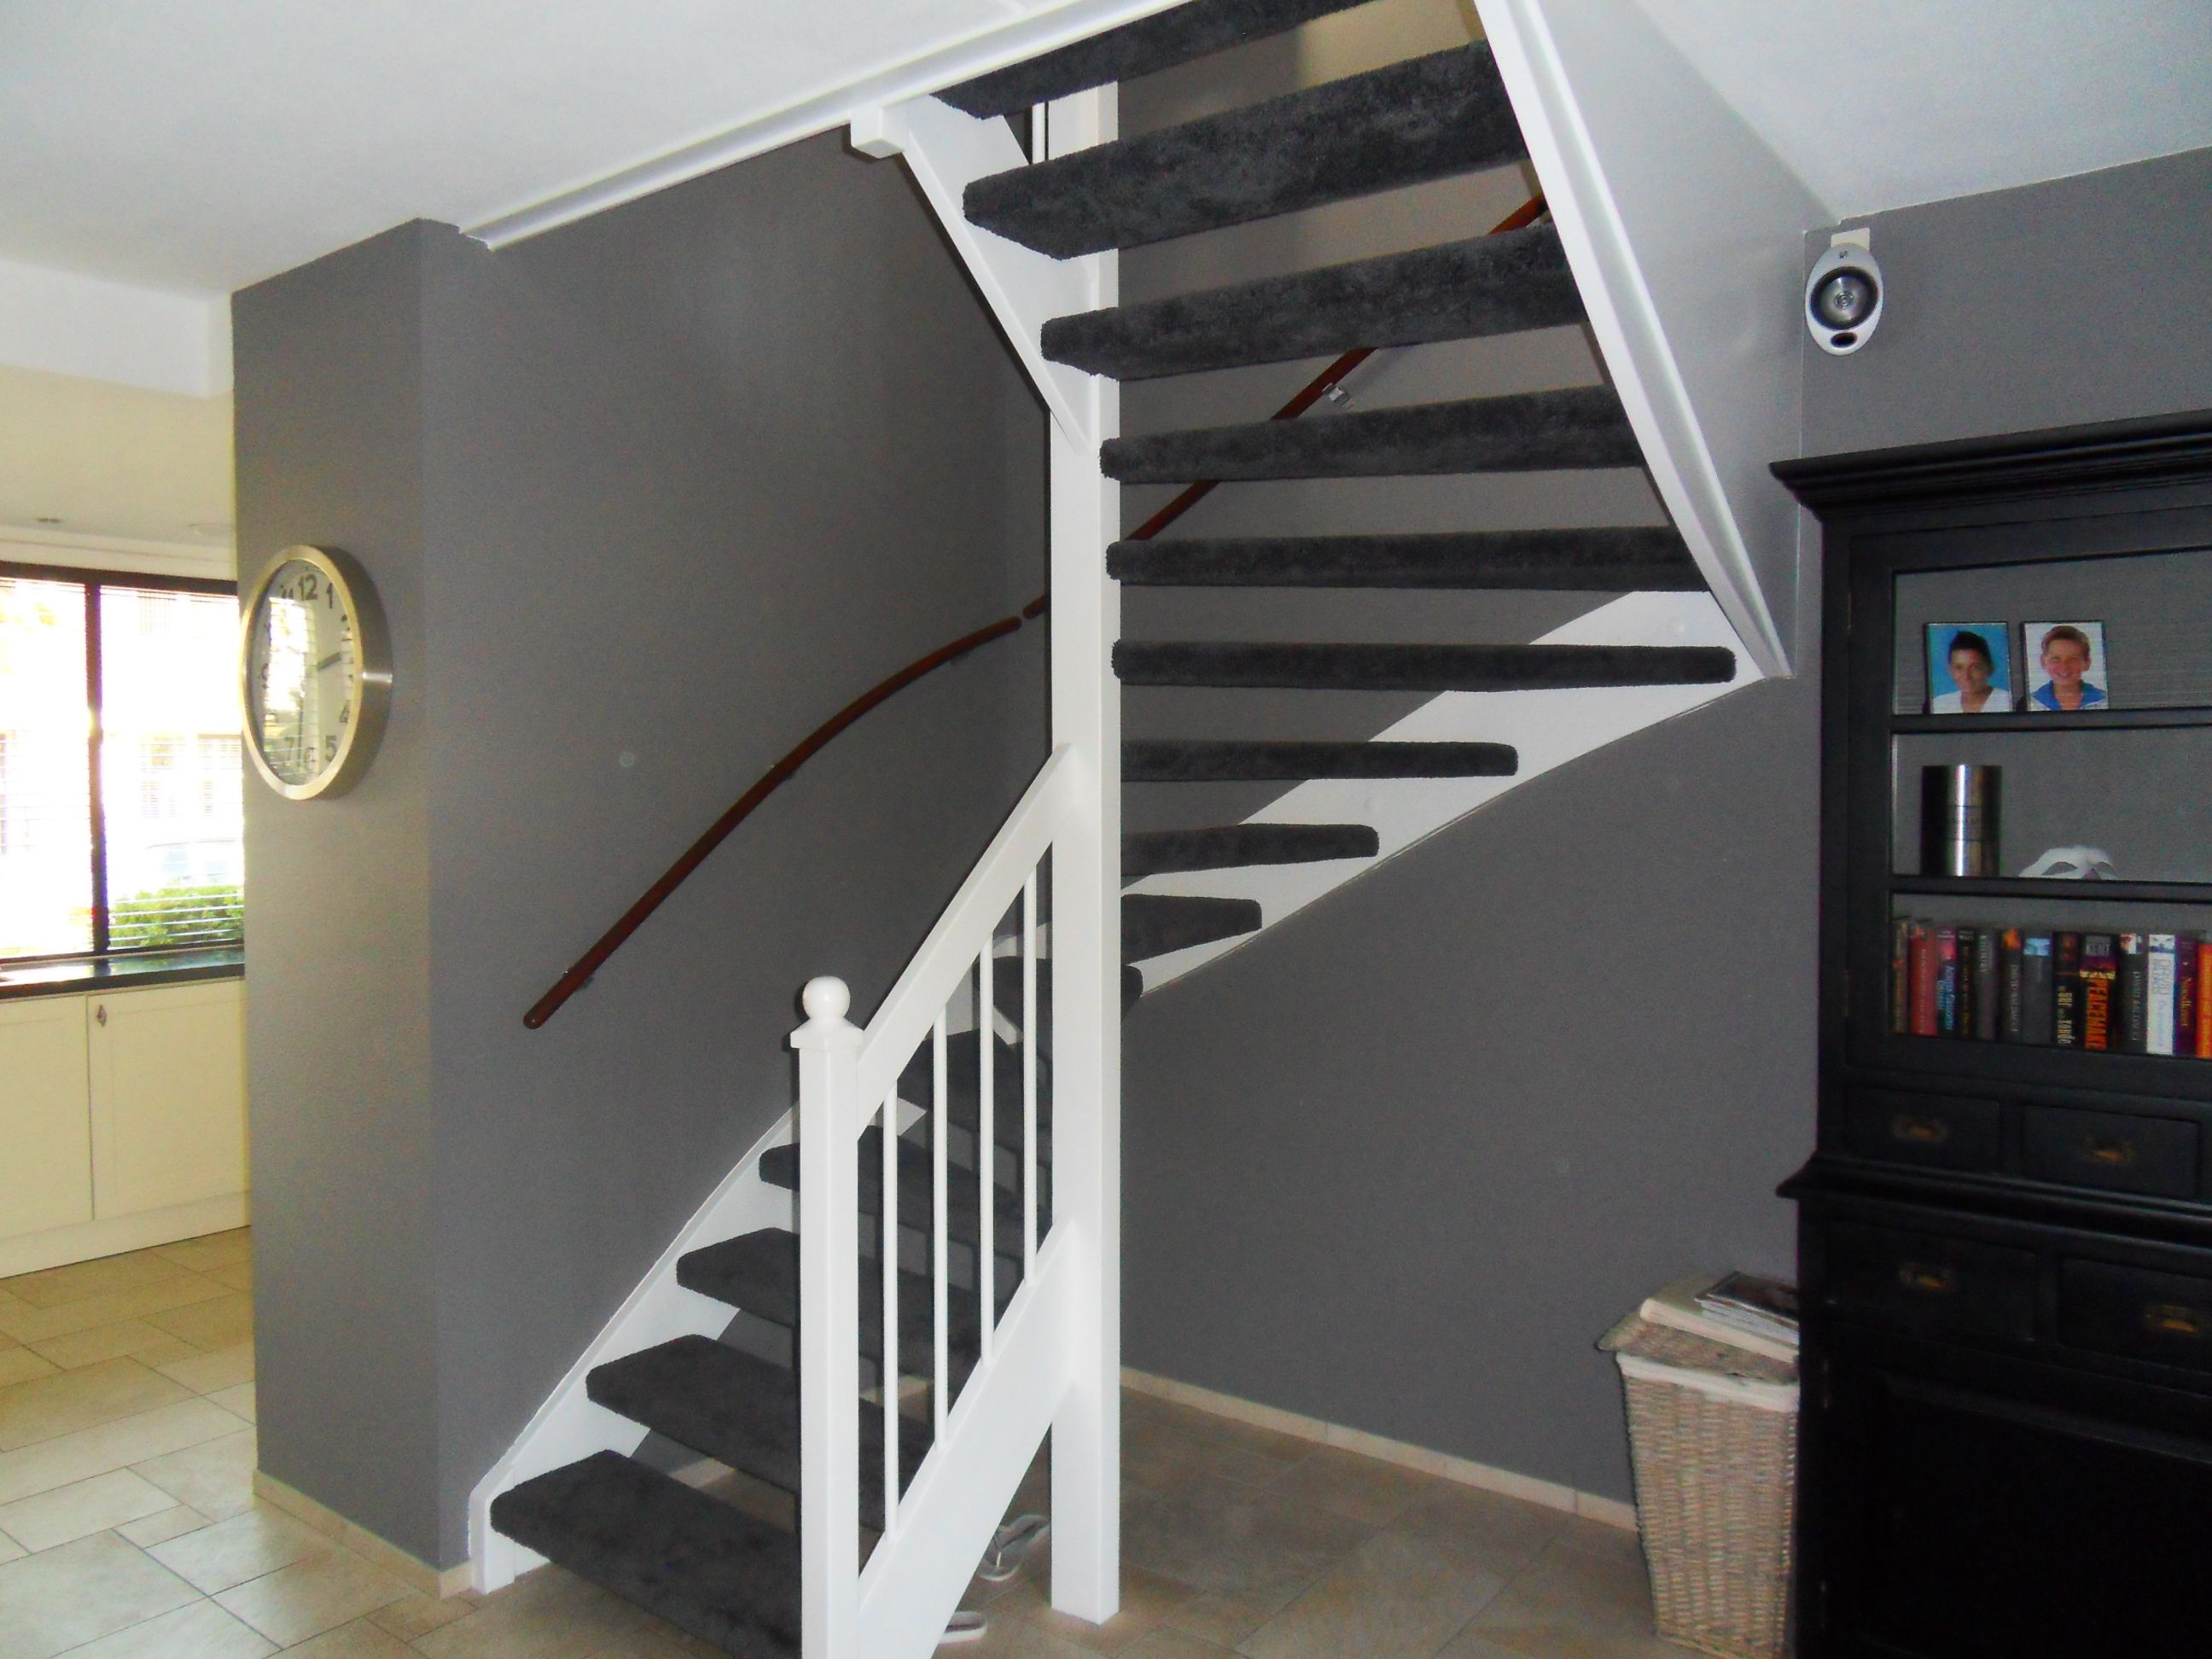 Afbeeldingsresultaat voor mooie gesloten klassieke trap in Trap in woonkamer